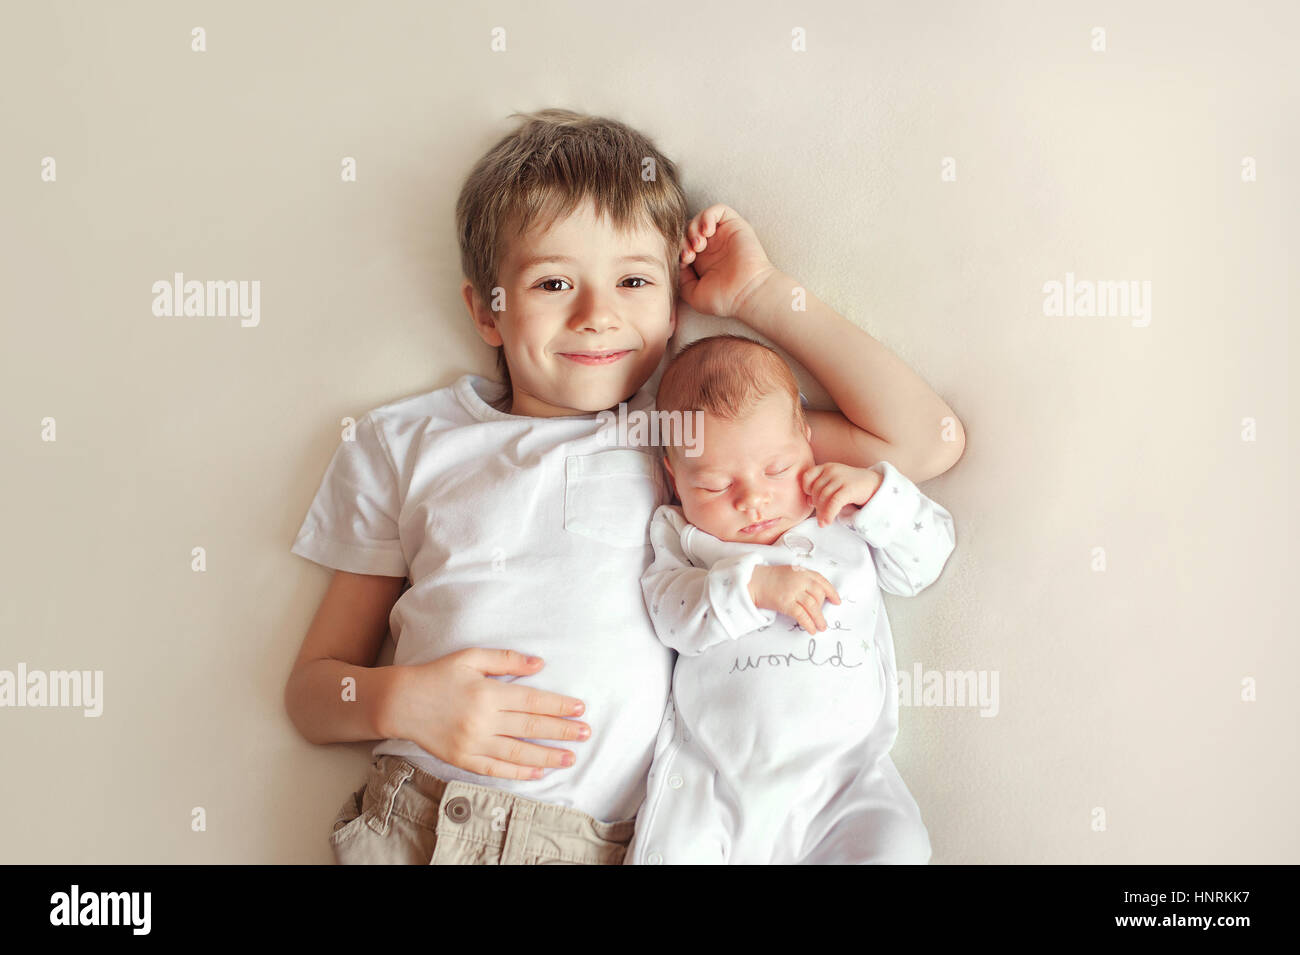 Little Brother Hugging Her Newborn Baby Toddler Kid